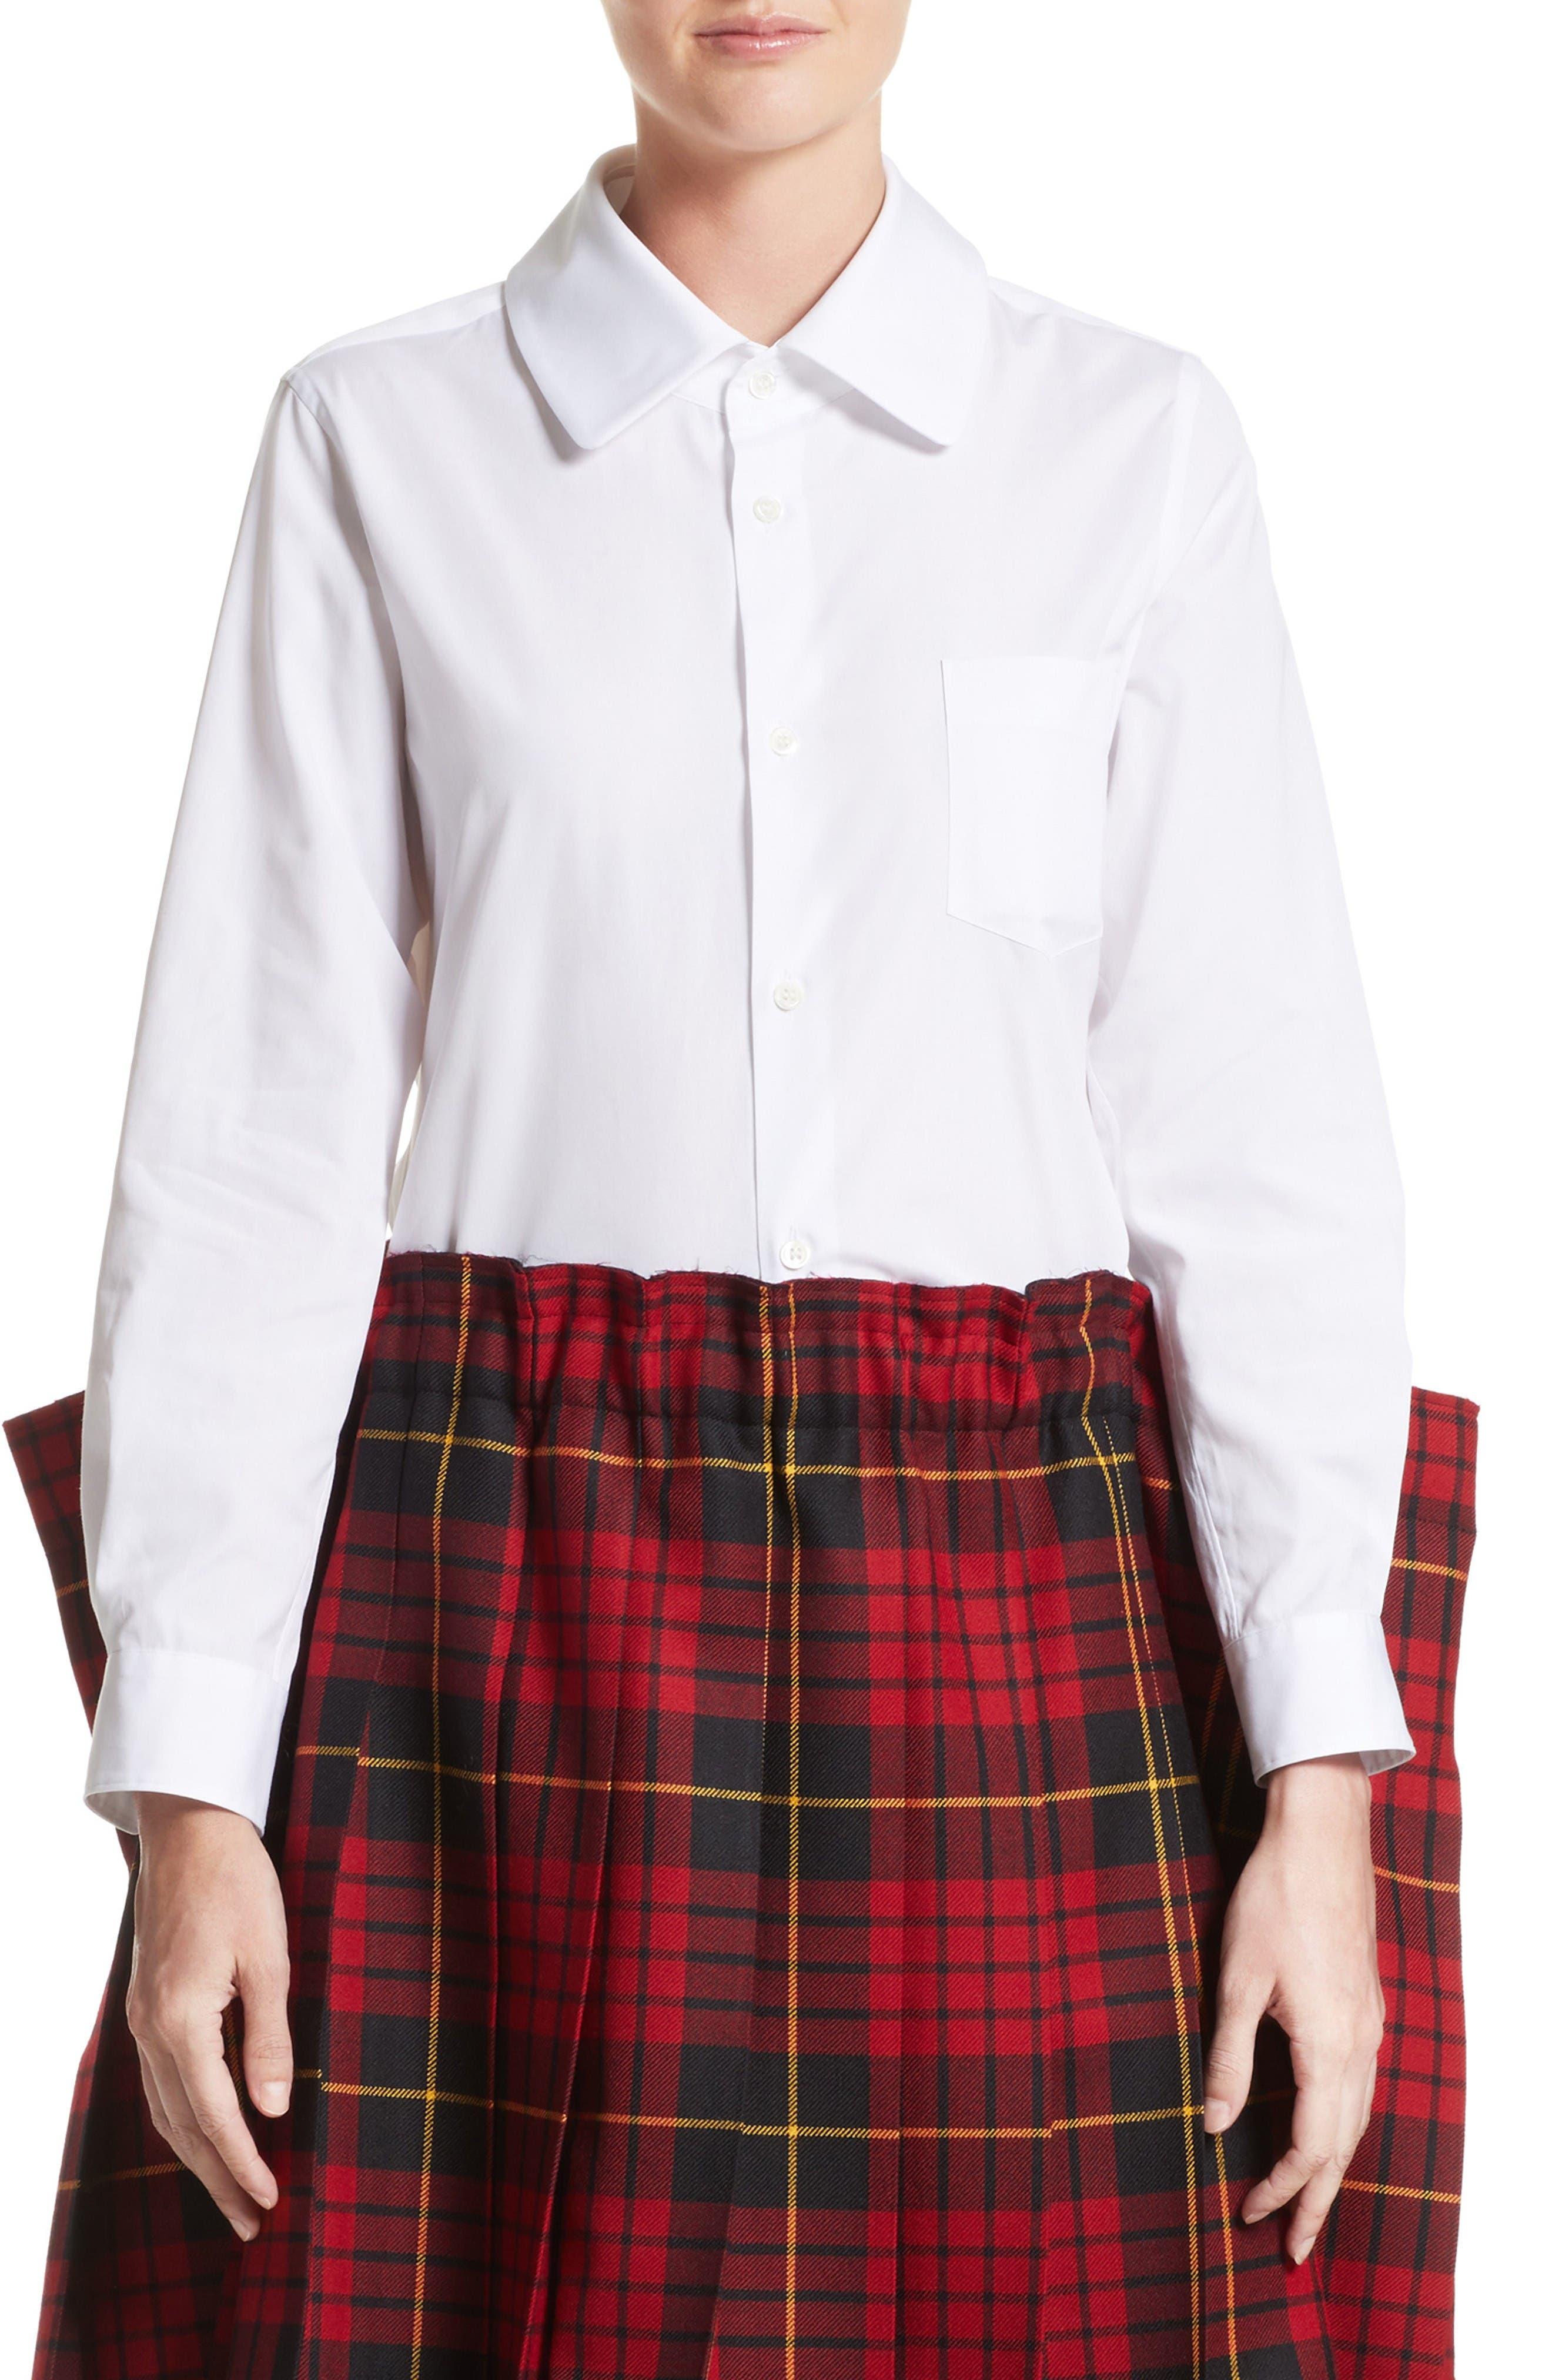 Cotton Broadcloth Blouse,                             Main thumbnail 1, color,                             White